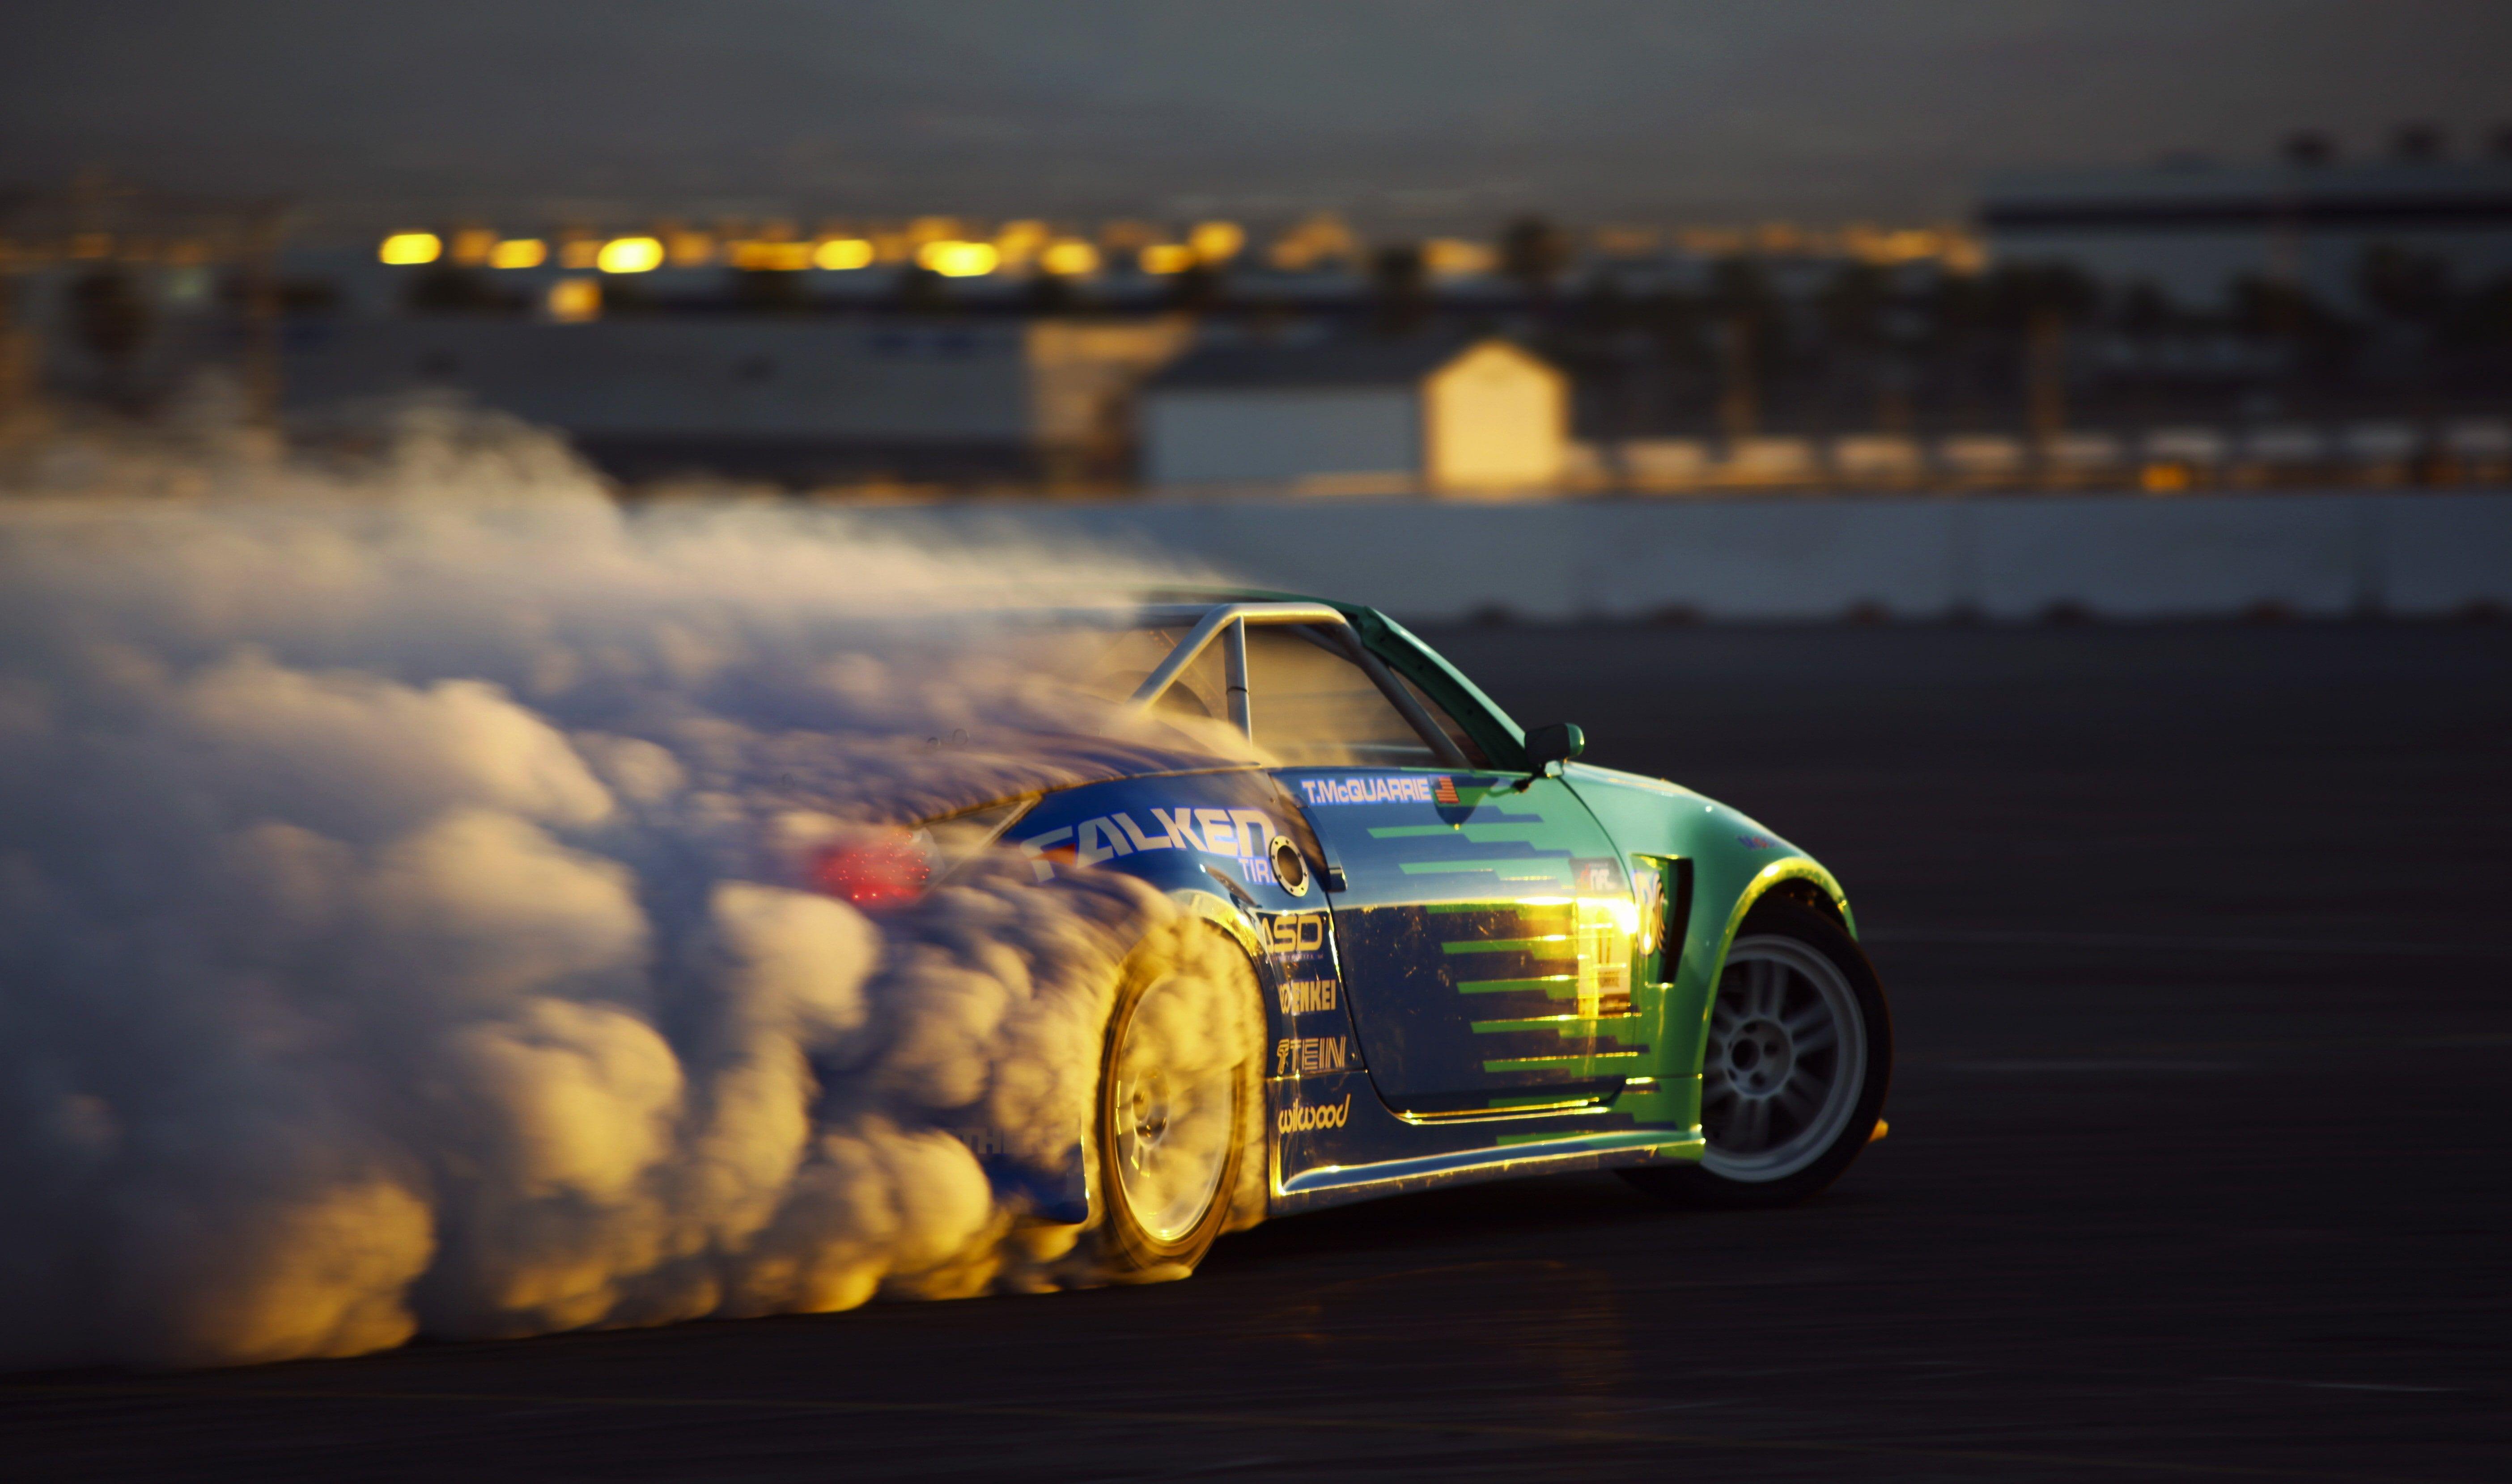 Car Smoke Burnout Sports Car Sunlight 5k Wallpaper Hdwallpaper Desktop Car Wallpapers Car Sports Wallpapers